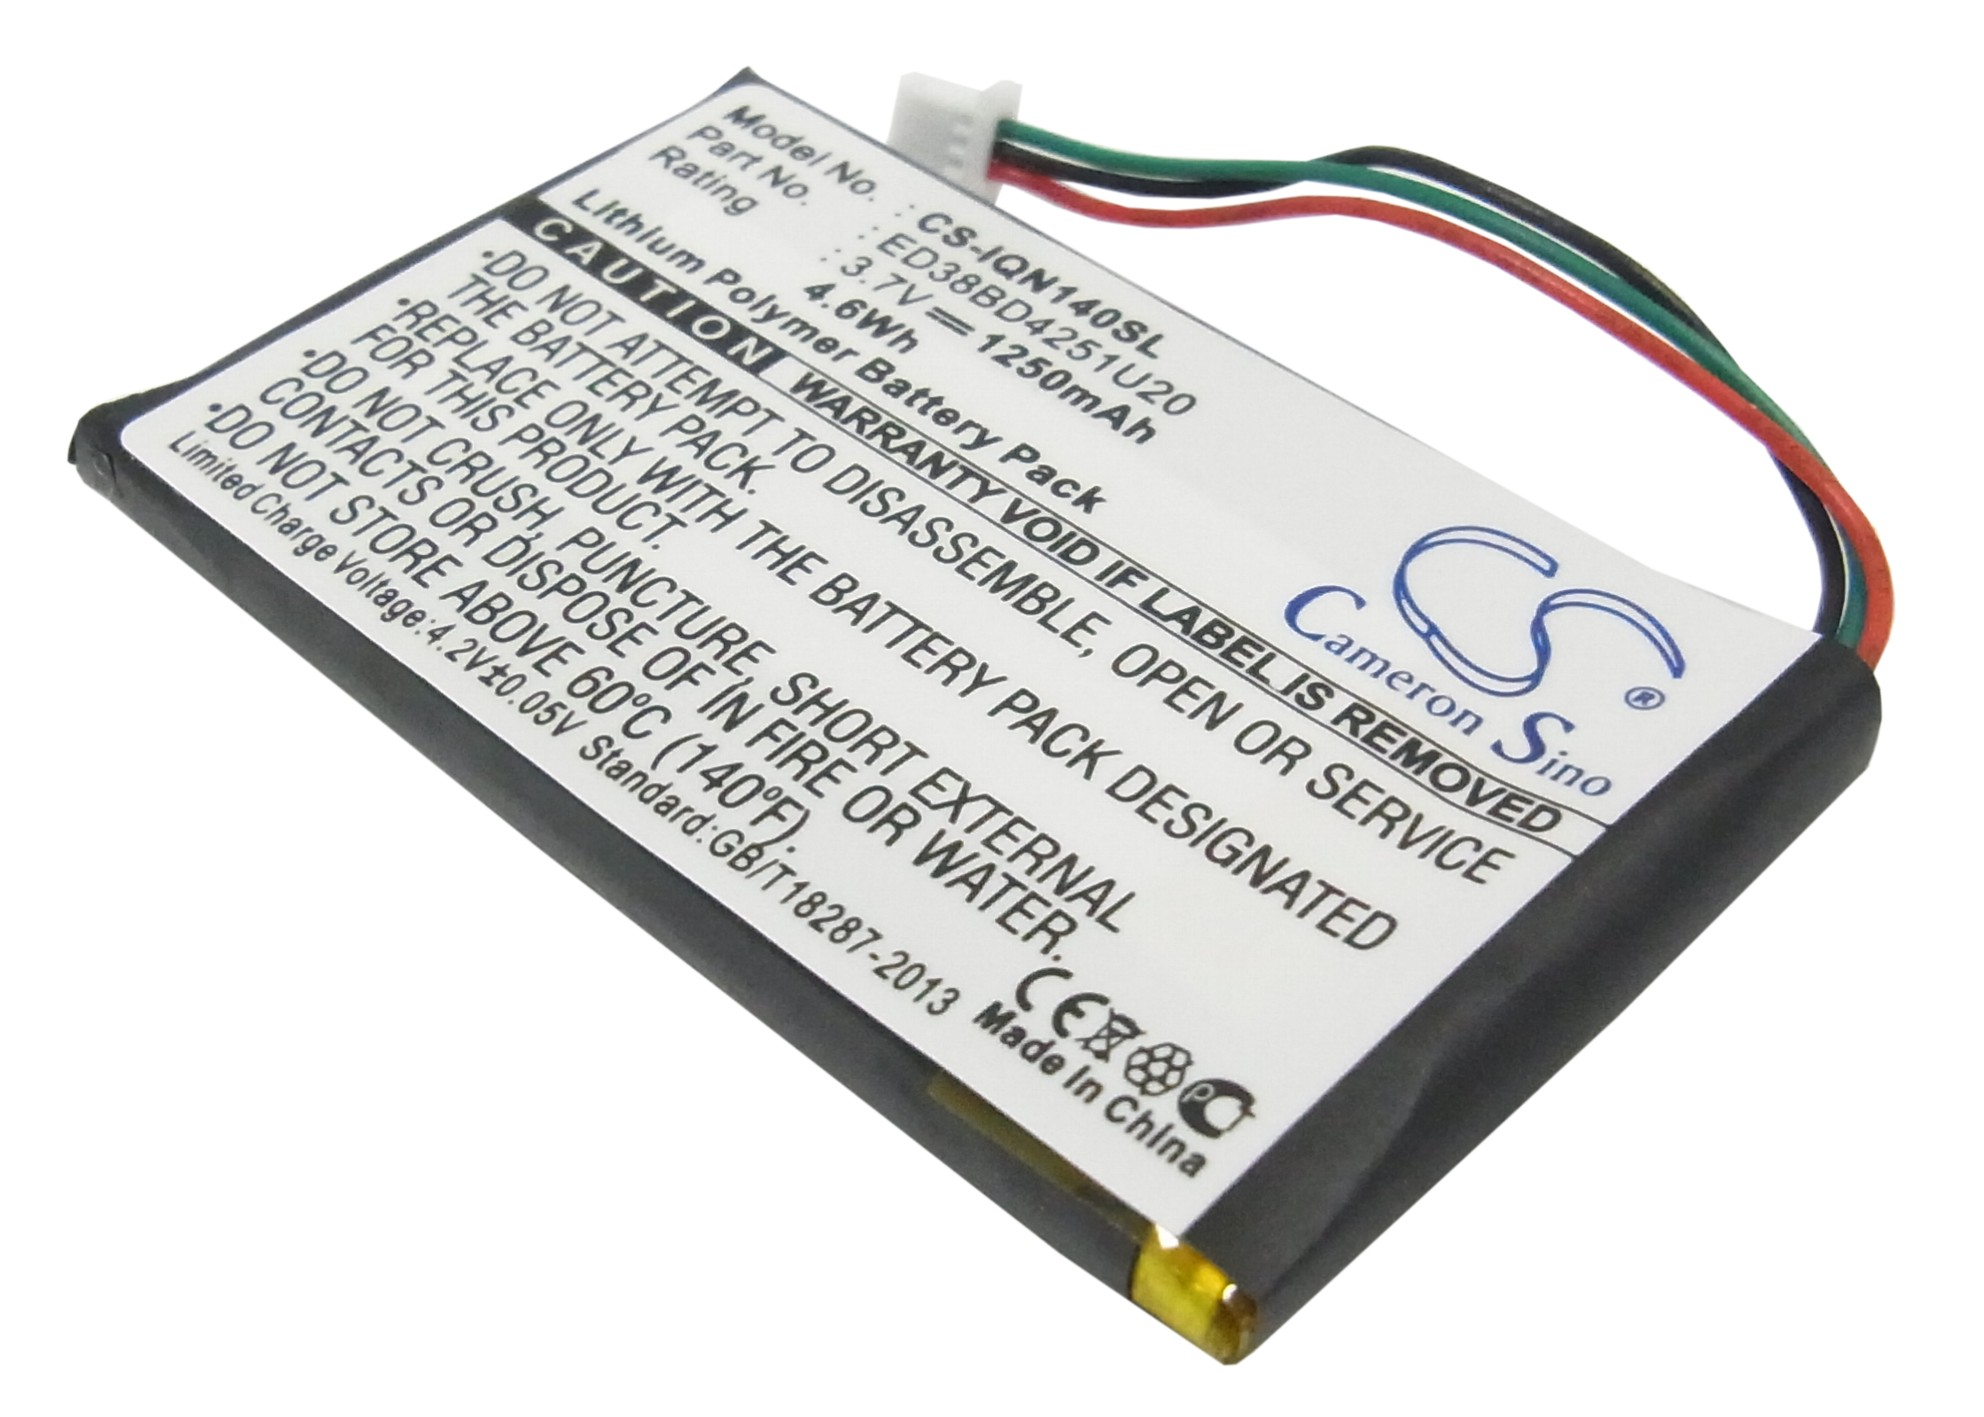 Cameron Sino baterie do navigací (gps) pro GARMIN Nuvi 1490 3.7V Li-Polymer 1250mAh černá - neoriginální